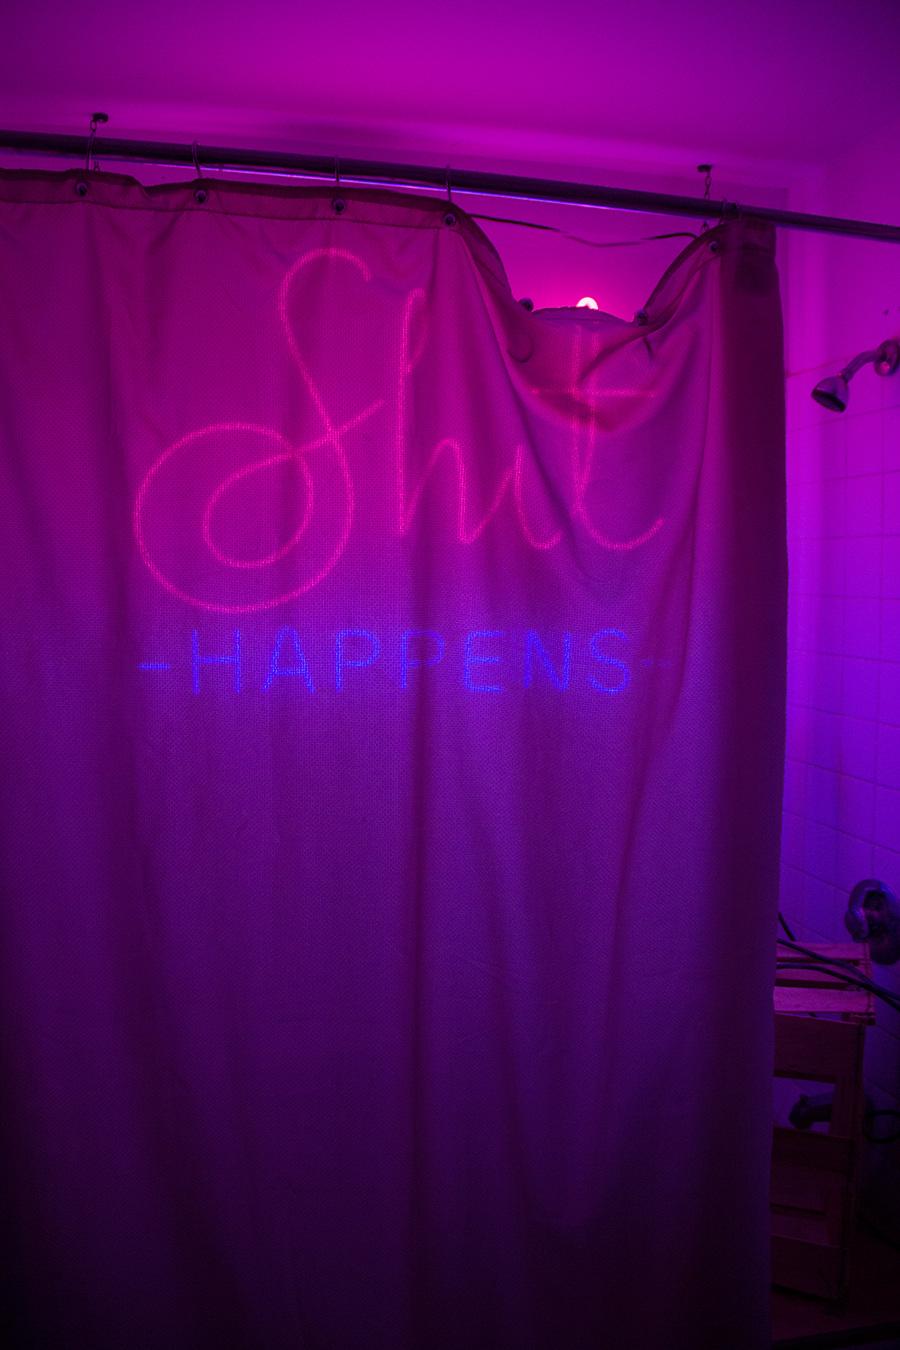 shit-happens-neon-art-camilorojas_900.jpg